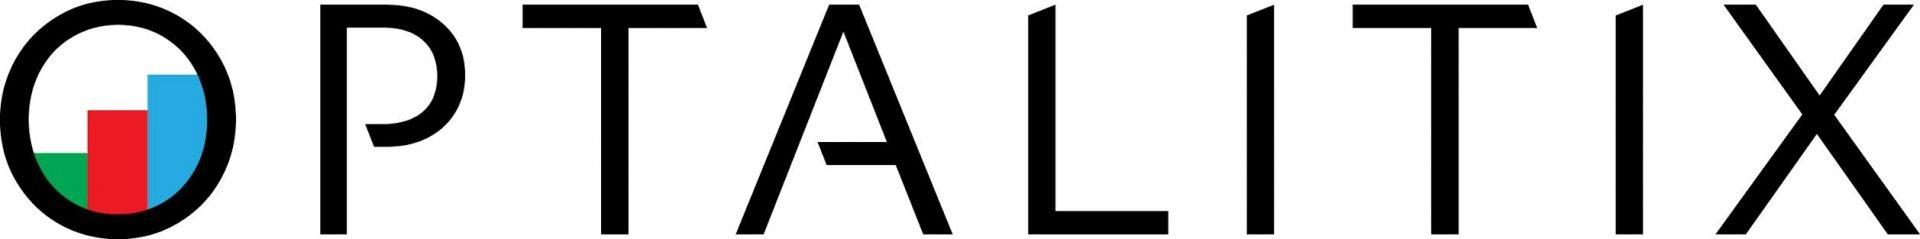 optalitix-logo